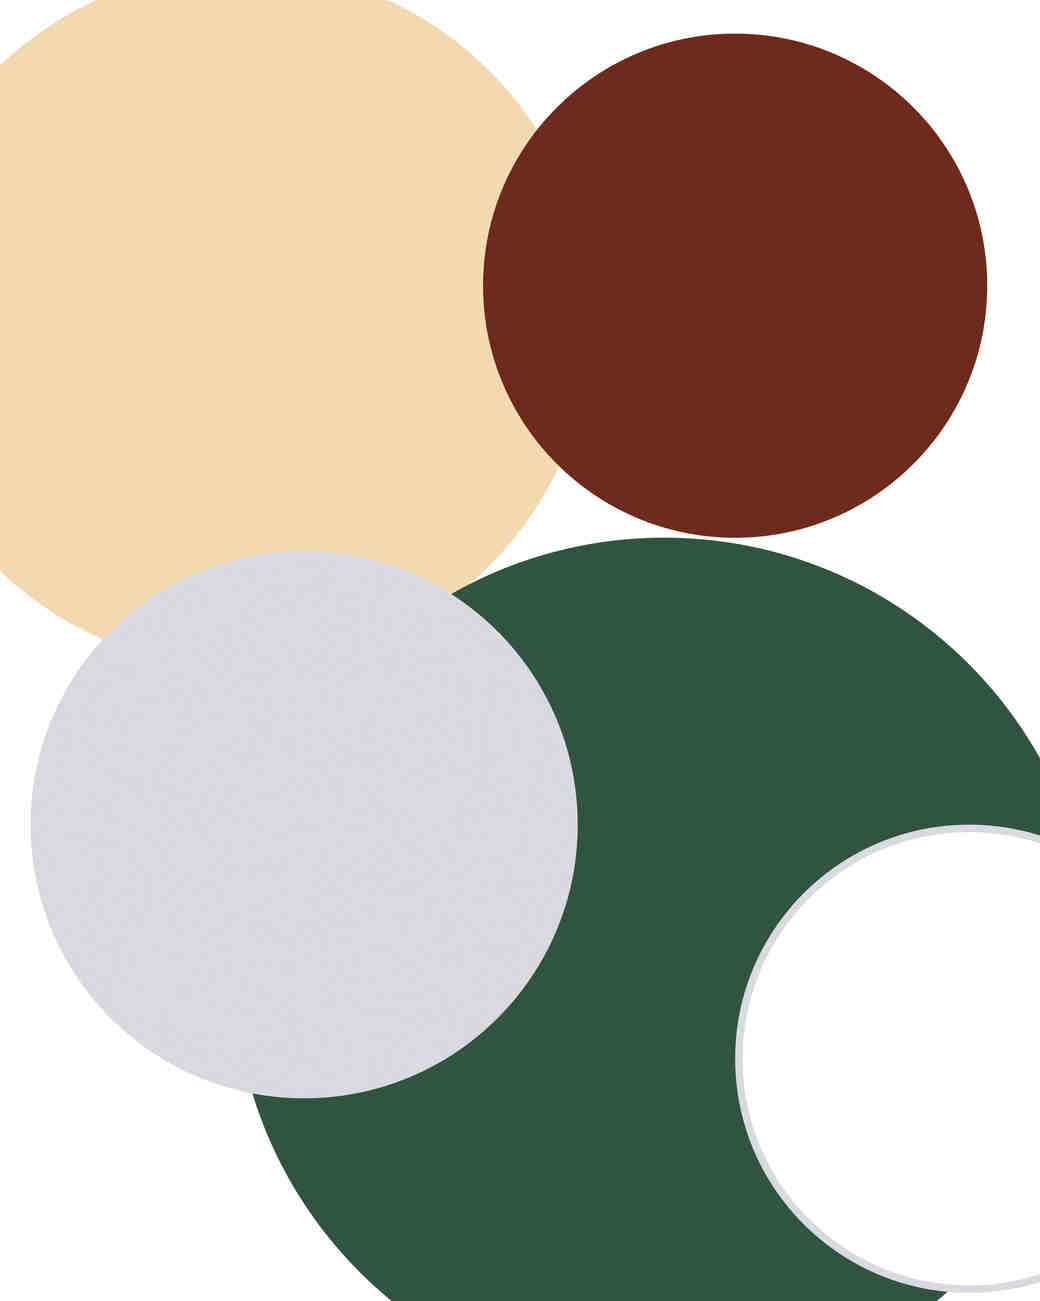 fall-wedding-colors-neutrals-green-0915.jpg